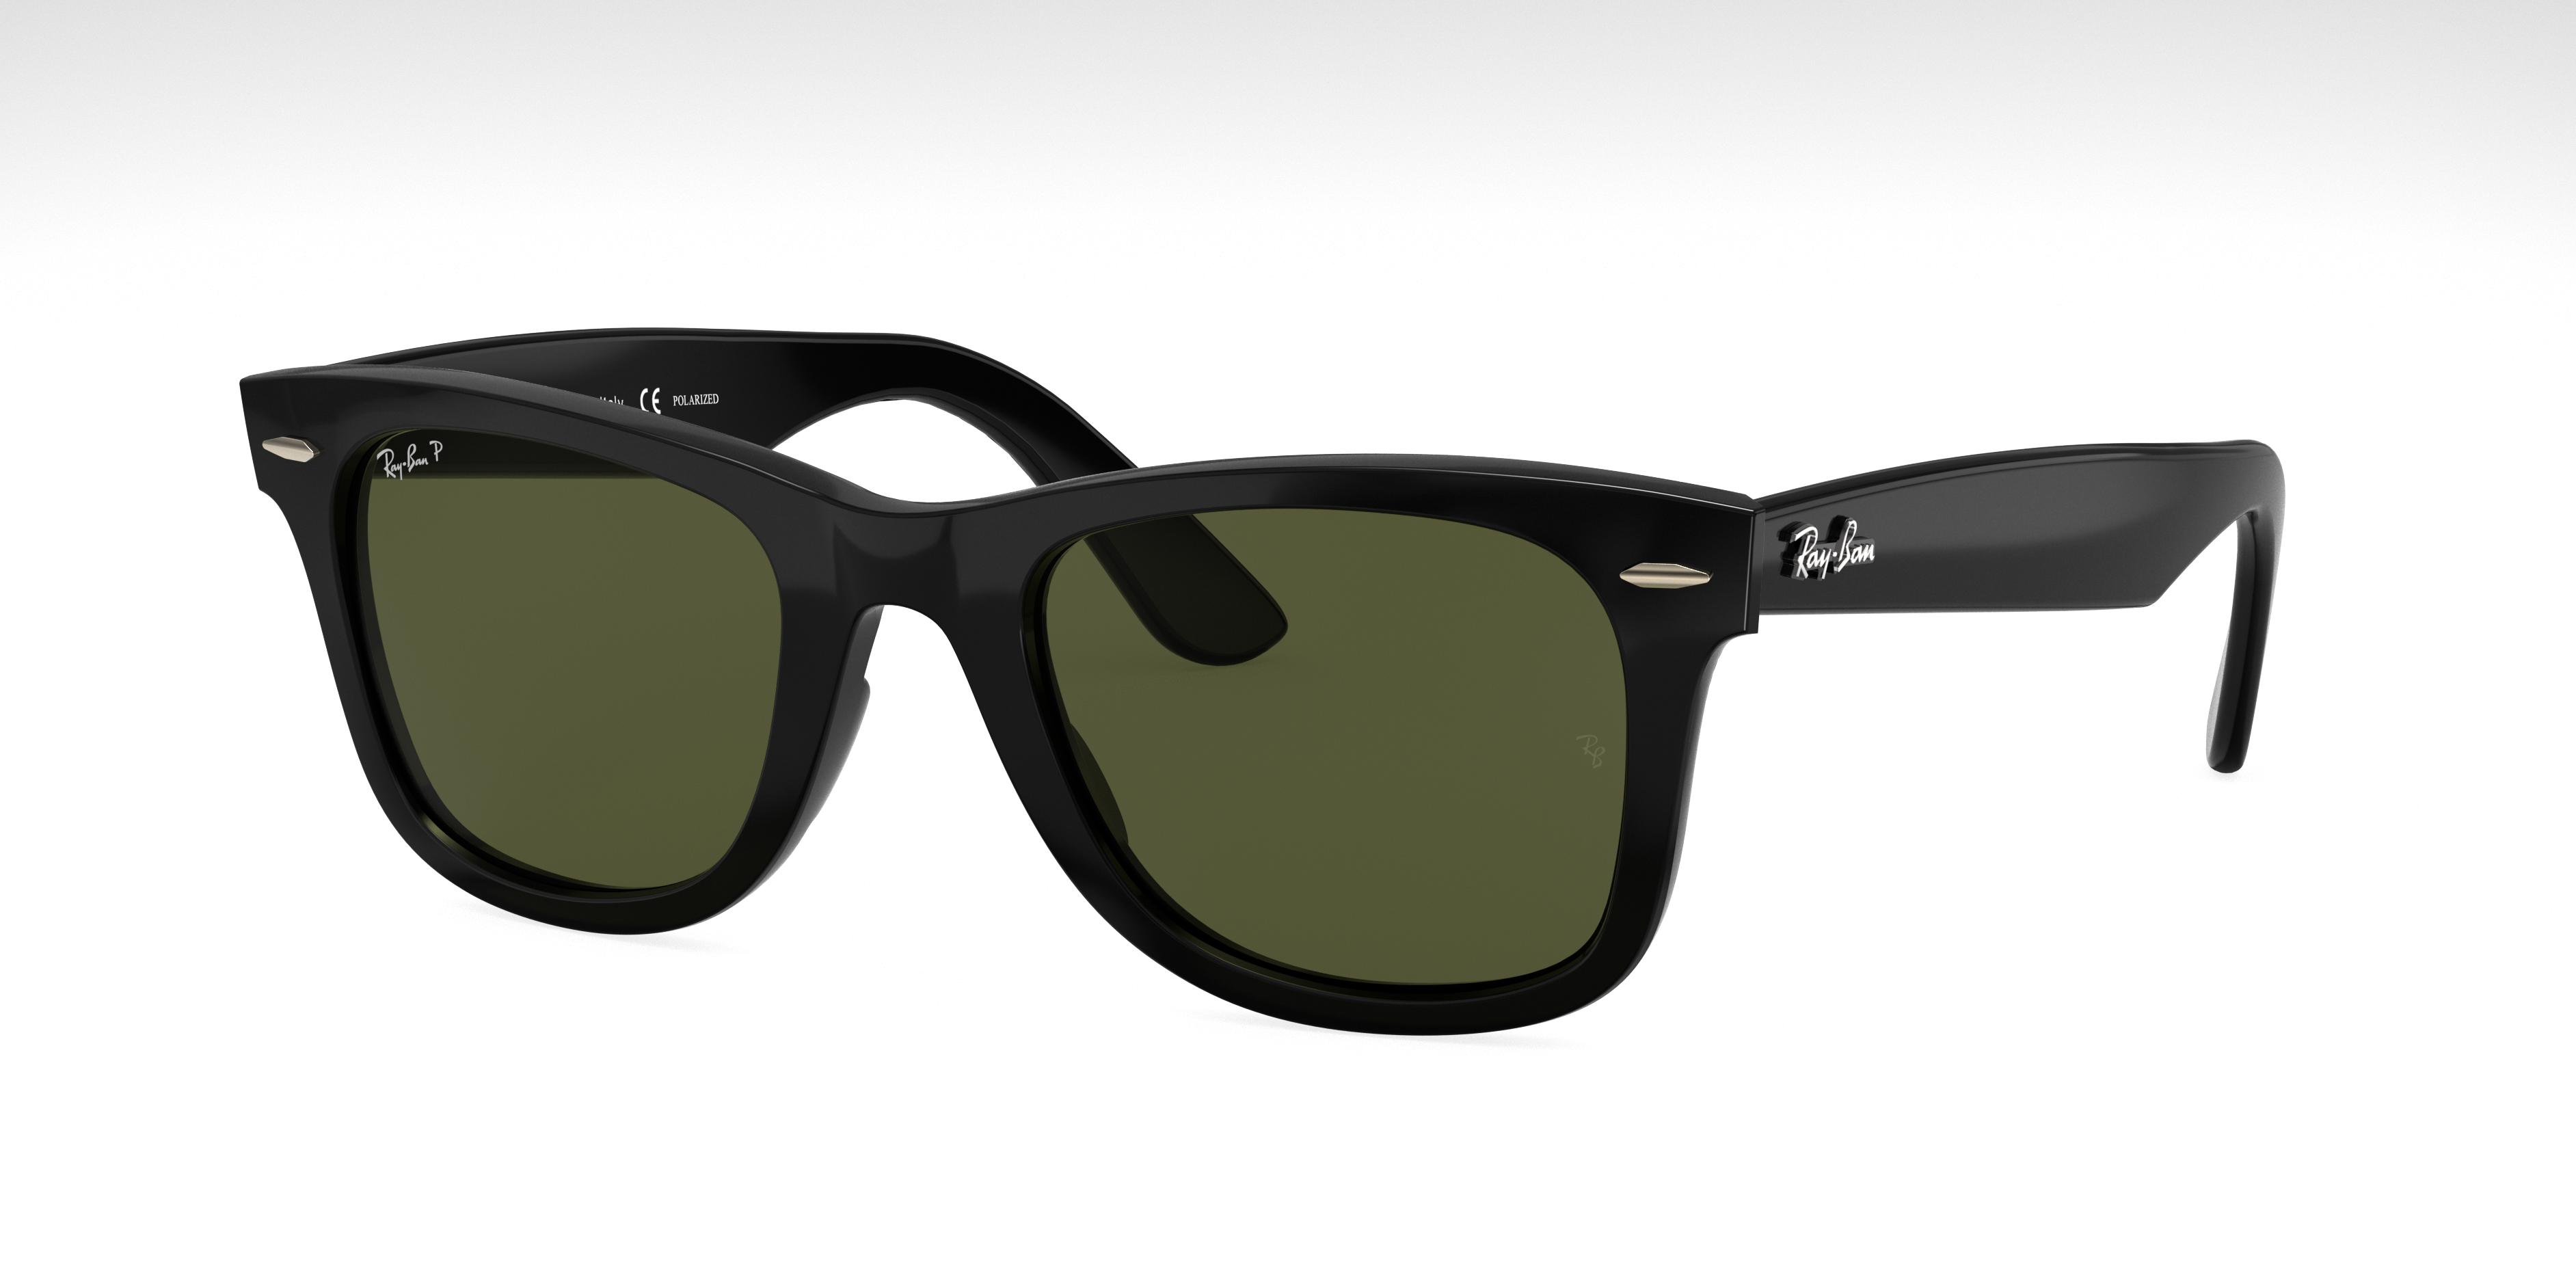 Ray-Ban Wayfarer Ease Black, Polarized Green Lenses - RB4340